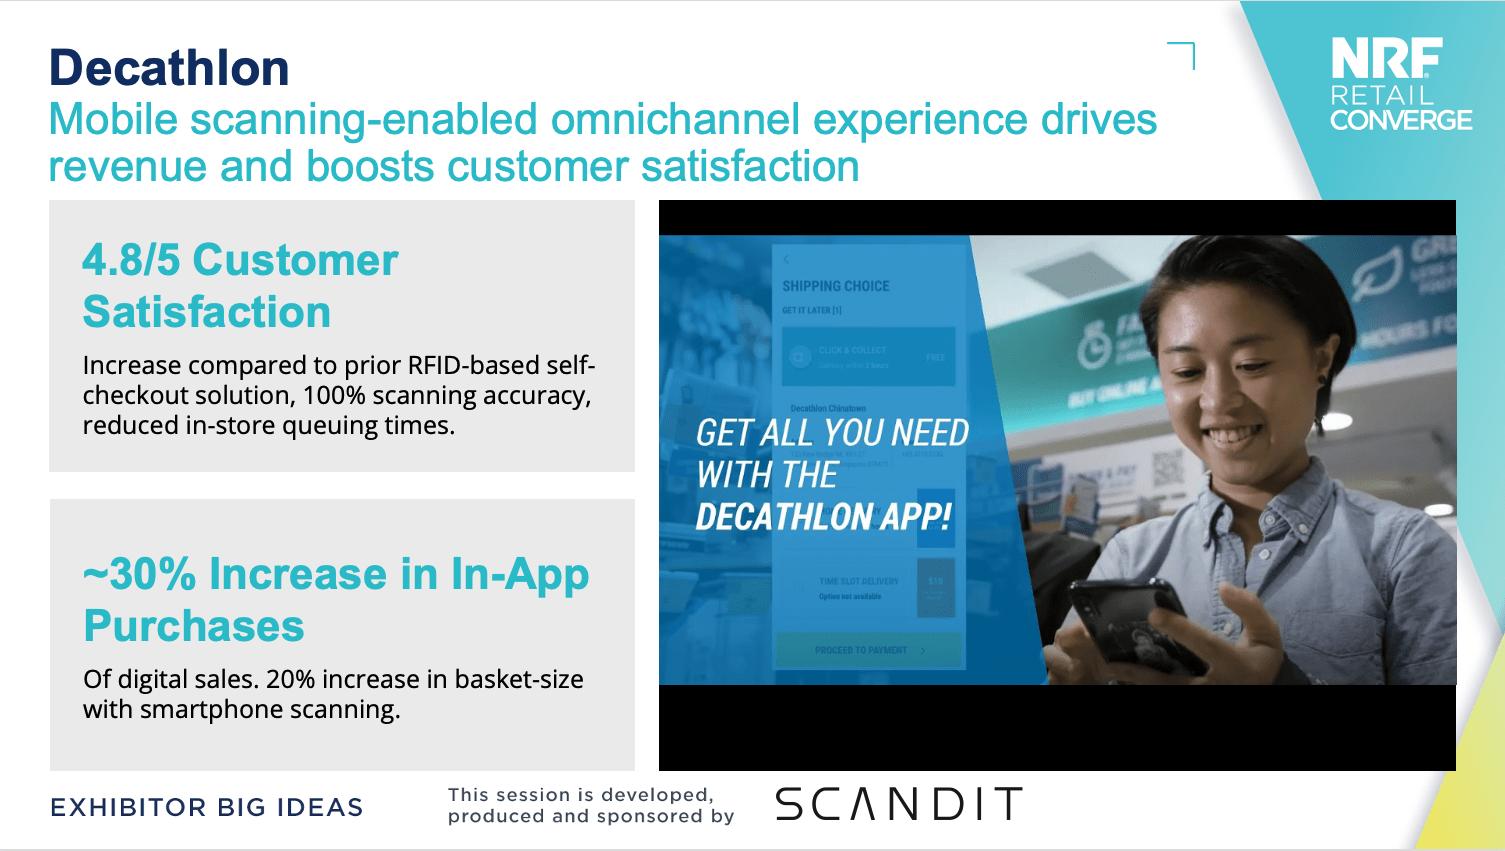 Scandit and Dechatlon success story at NRF Retail Converge 2021